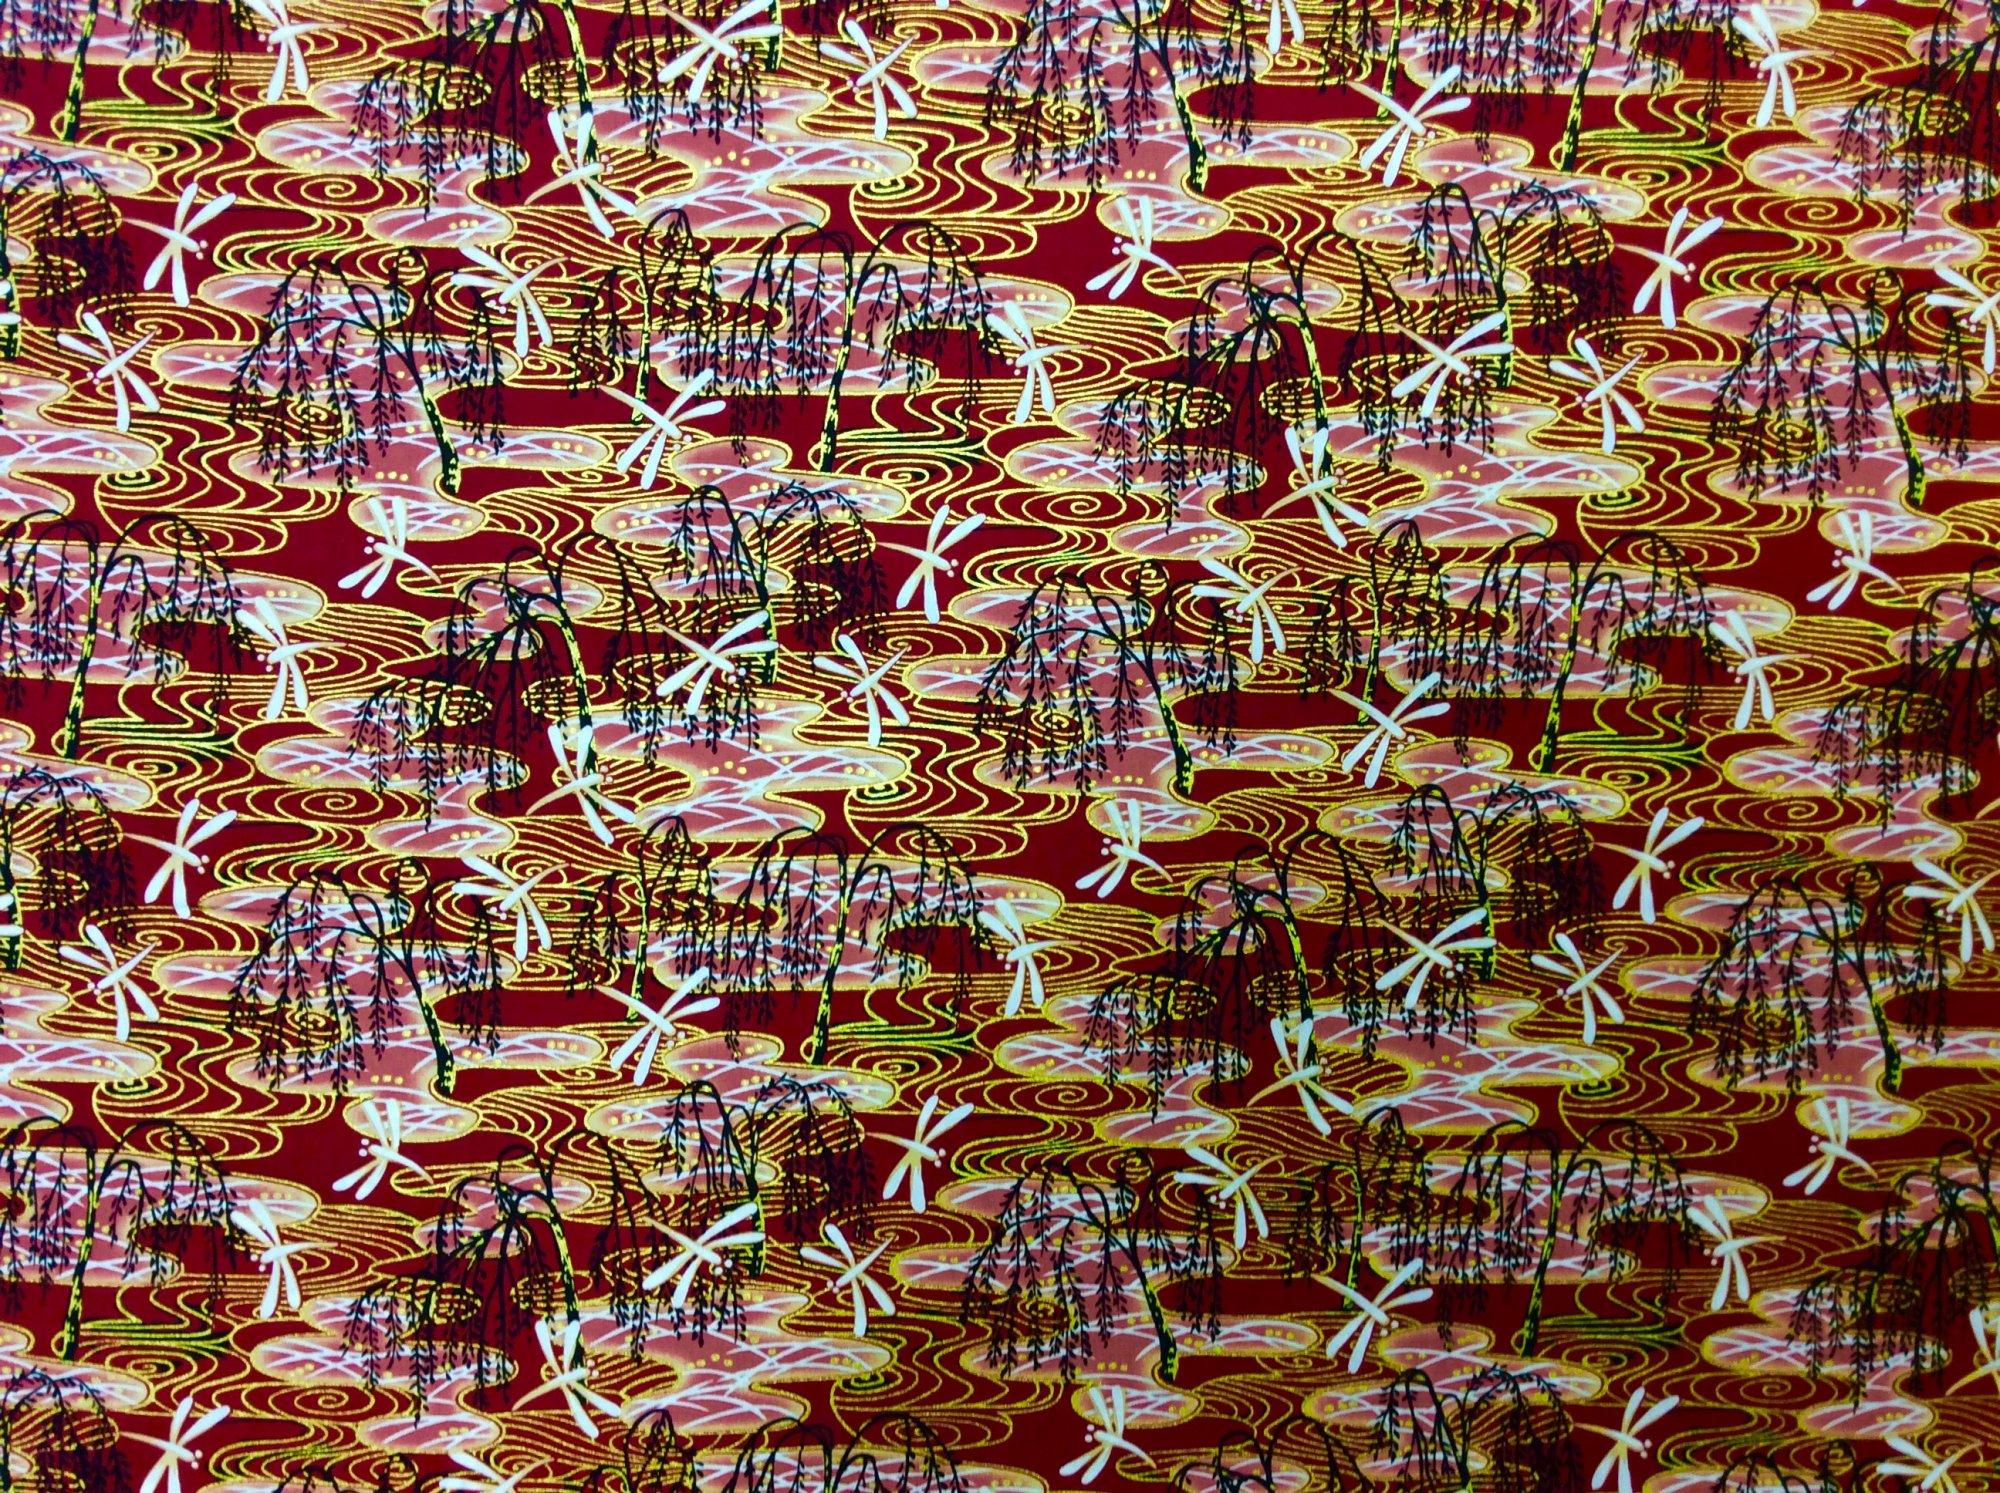 Asian Exotic Dragonfly Bonsai Blue Gold Japan Asian Cotton Quilt Fabric TP052